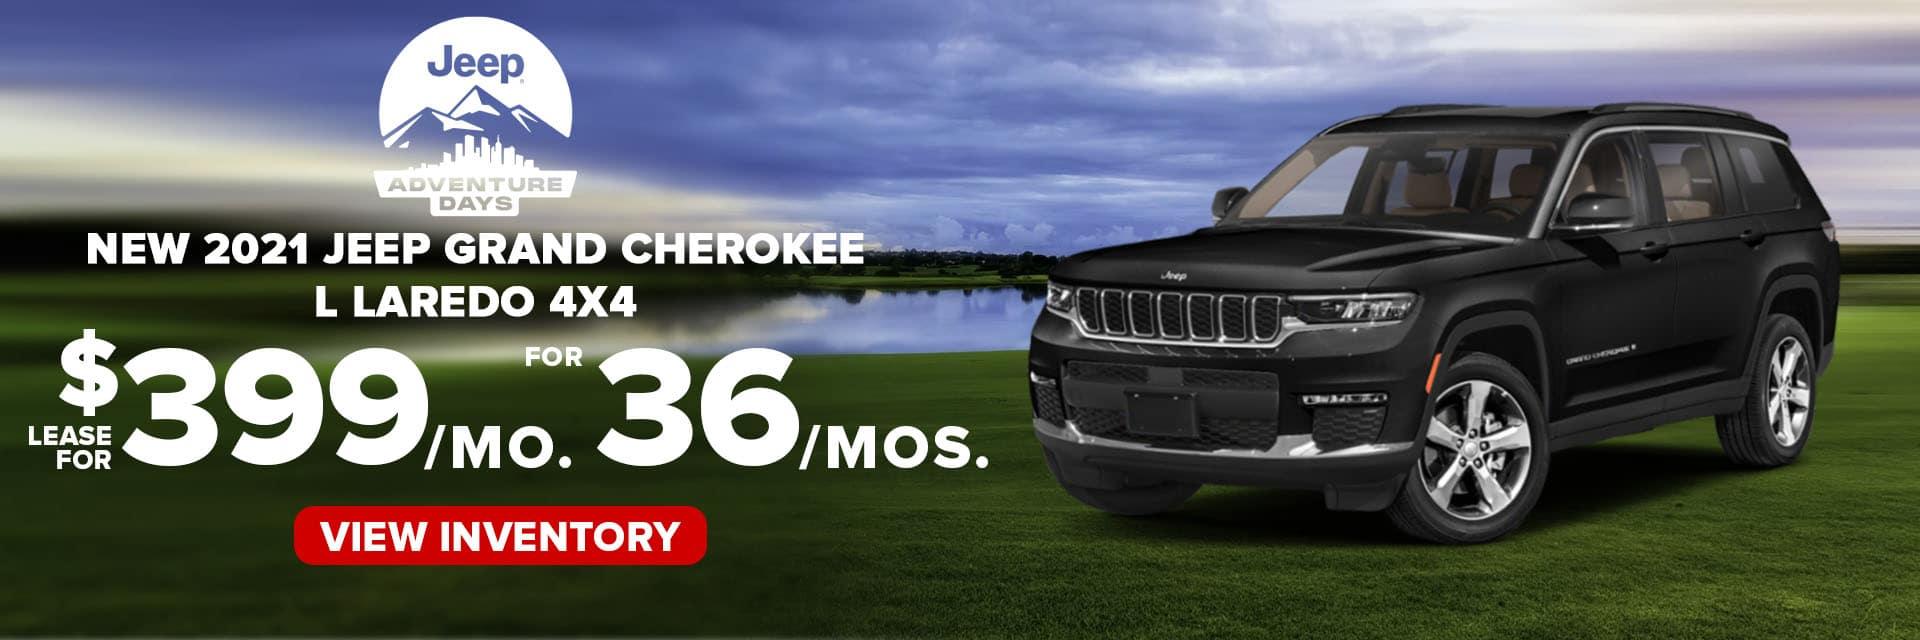 SLCJ-October 2021-2021 Jeep Grand Cherokee copy